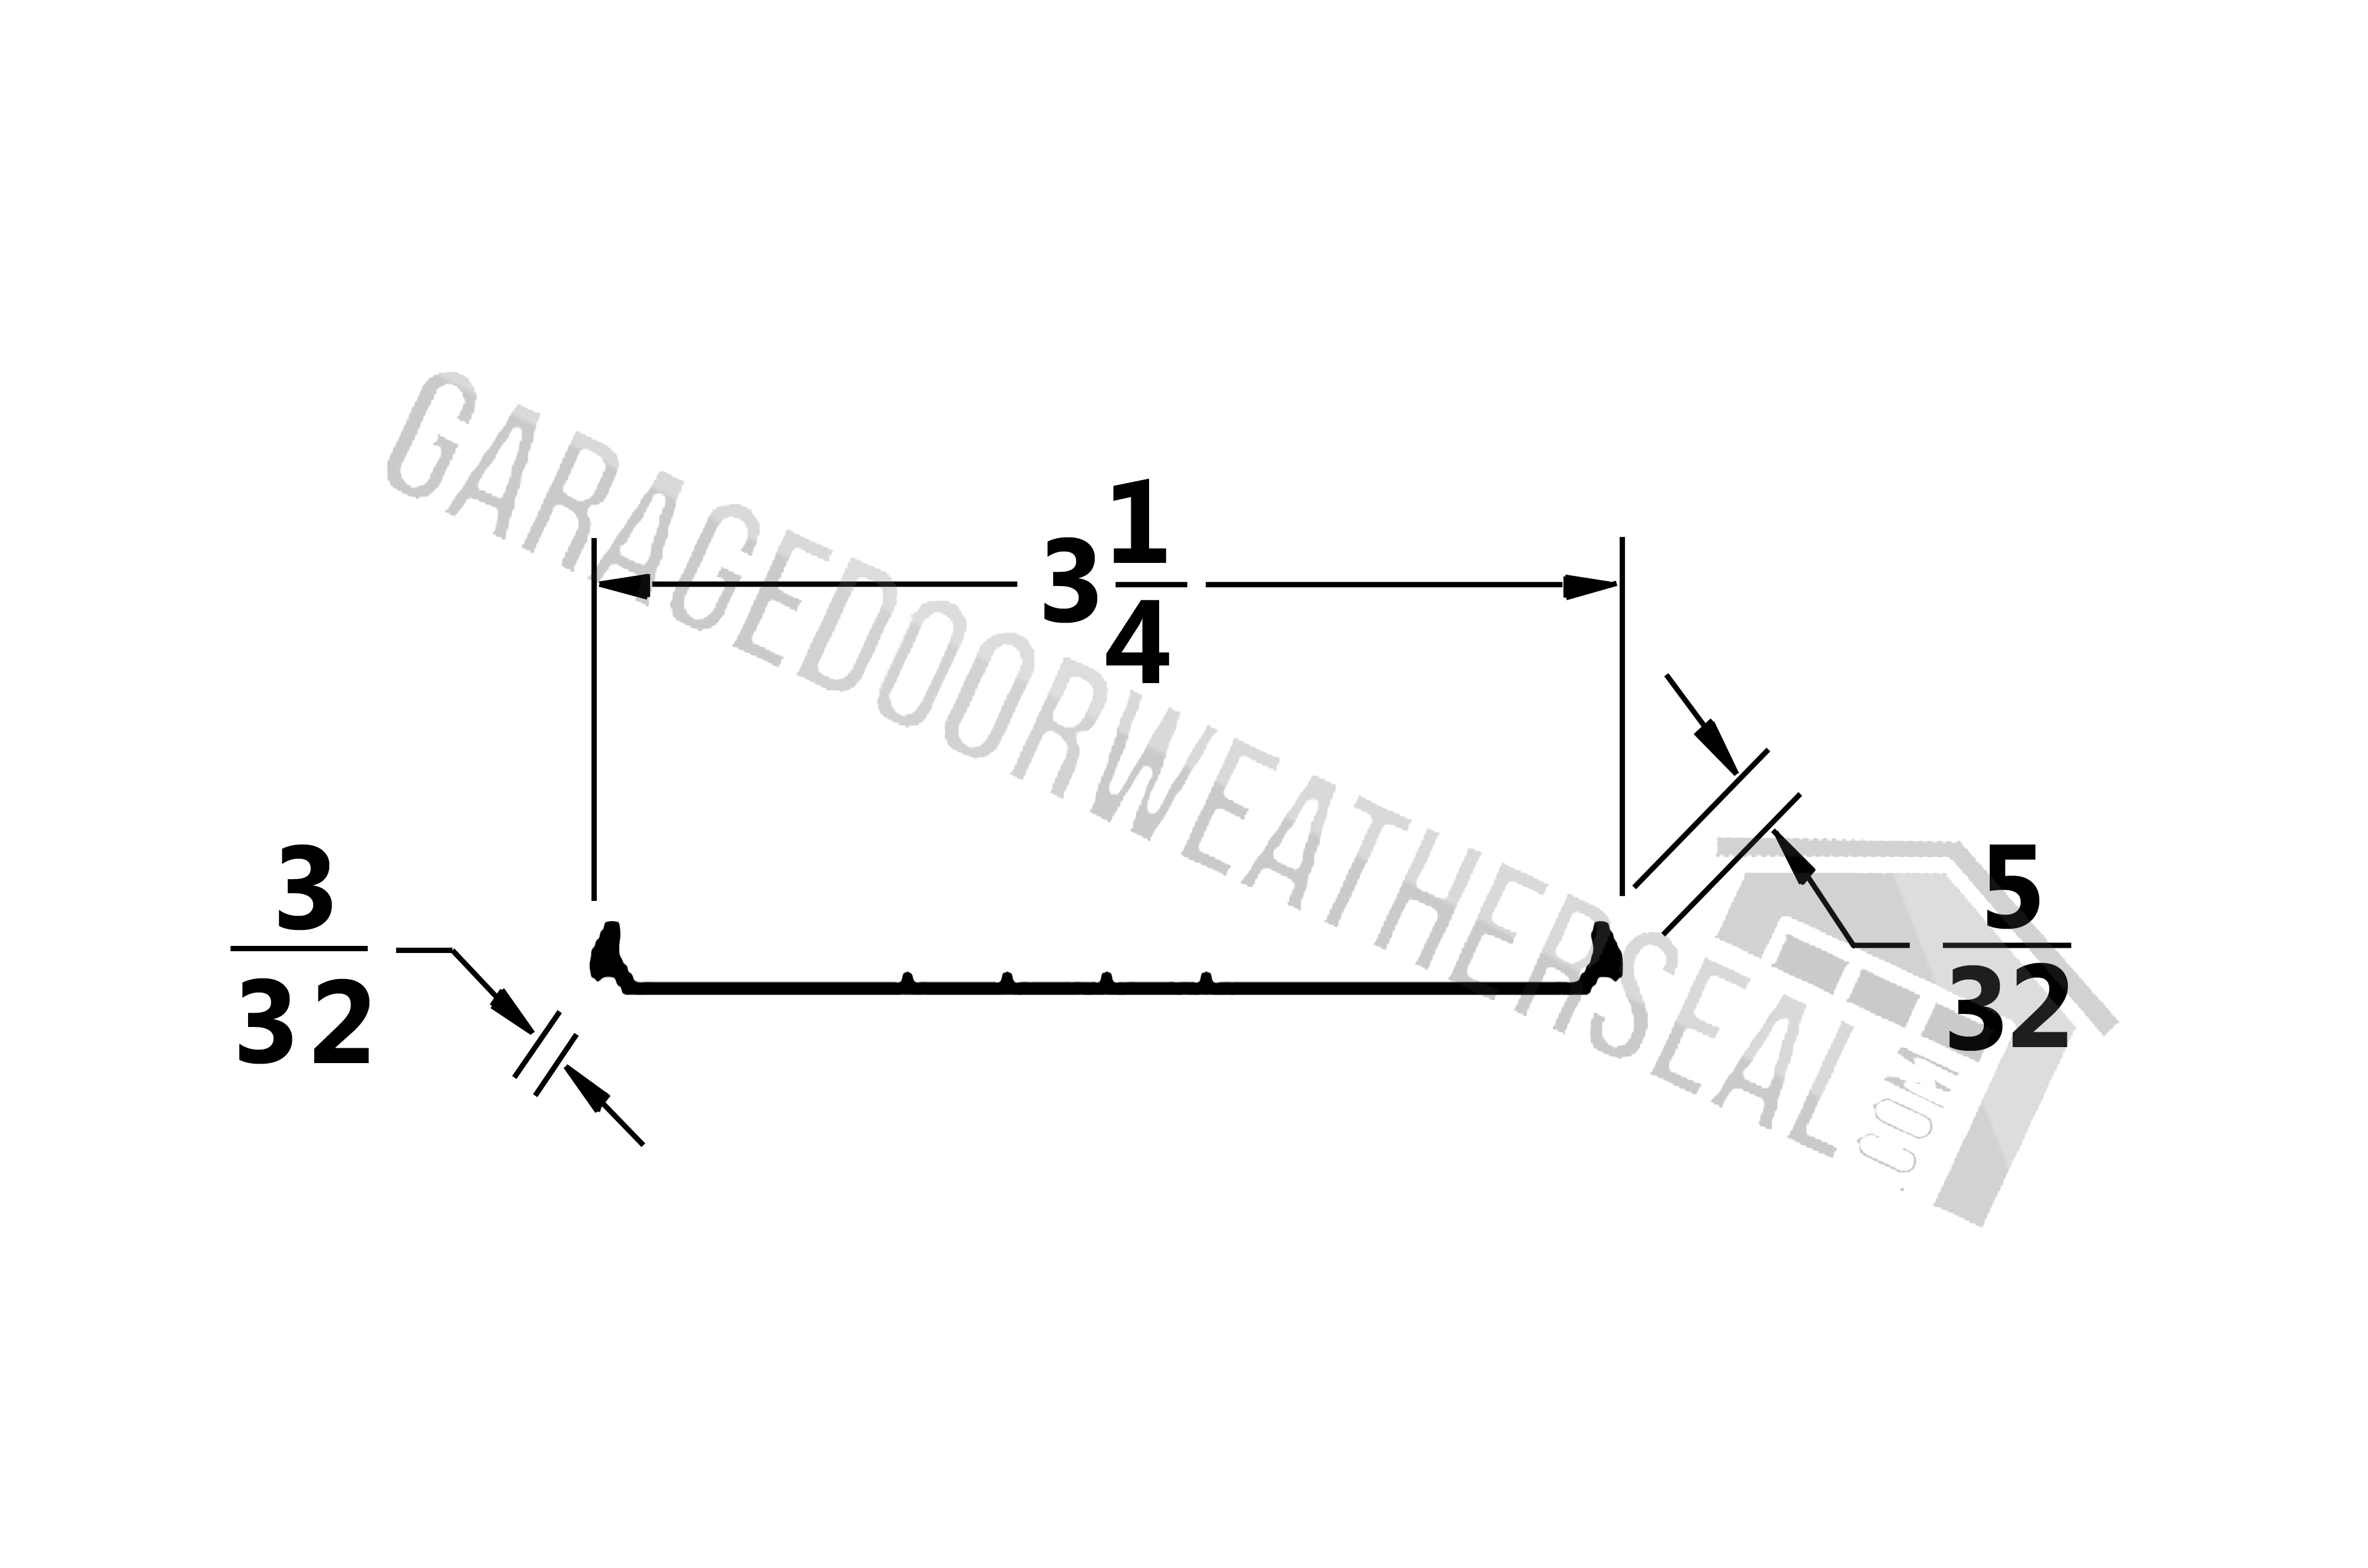 Garage Door Opener Wiring Diagram Likewise Chamberlain Auto On Capacitor 139 53425srt